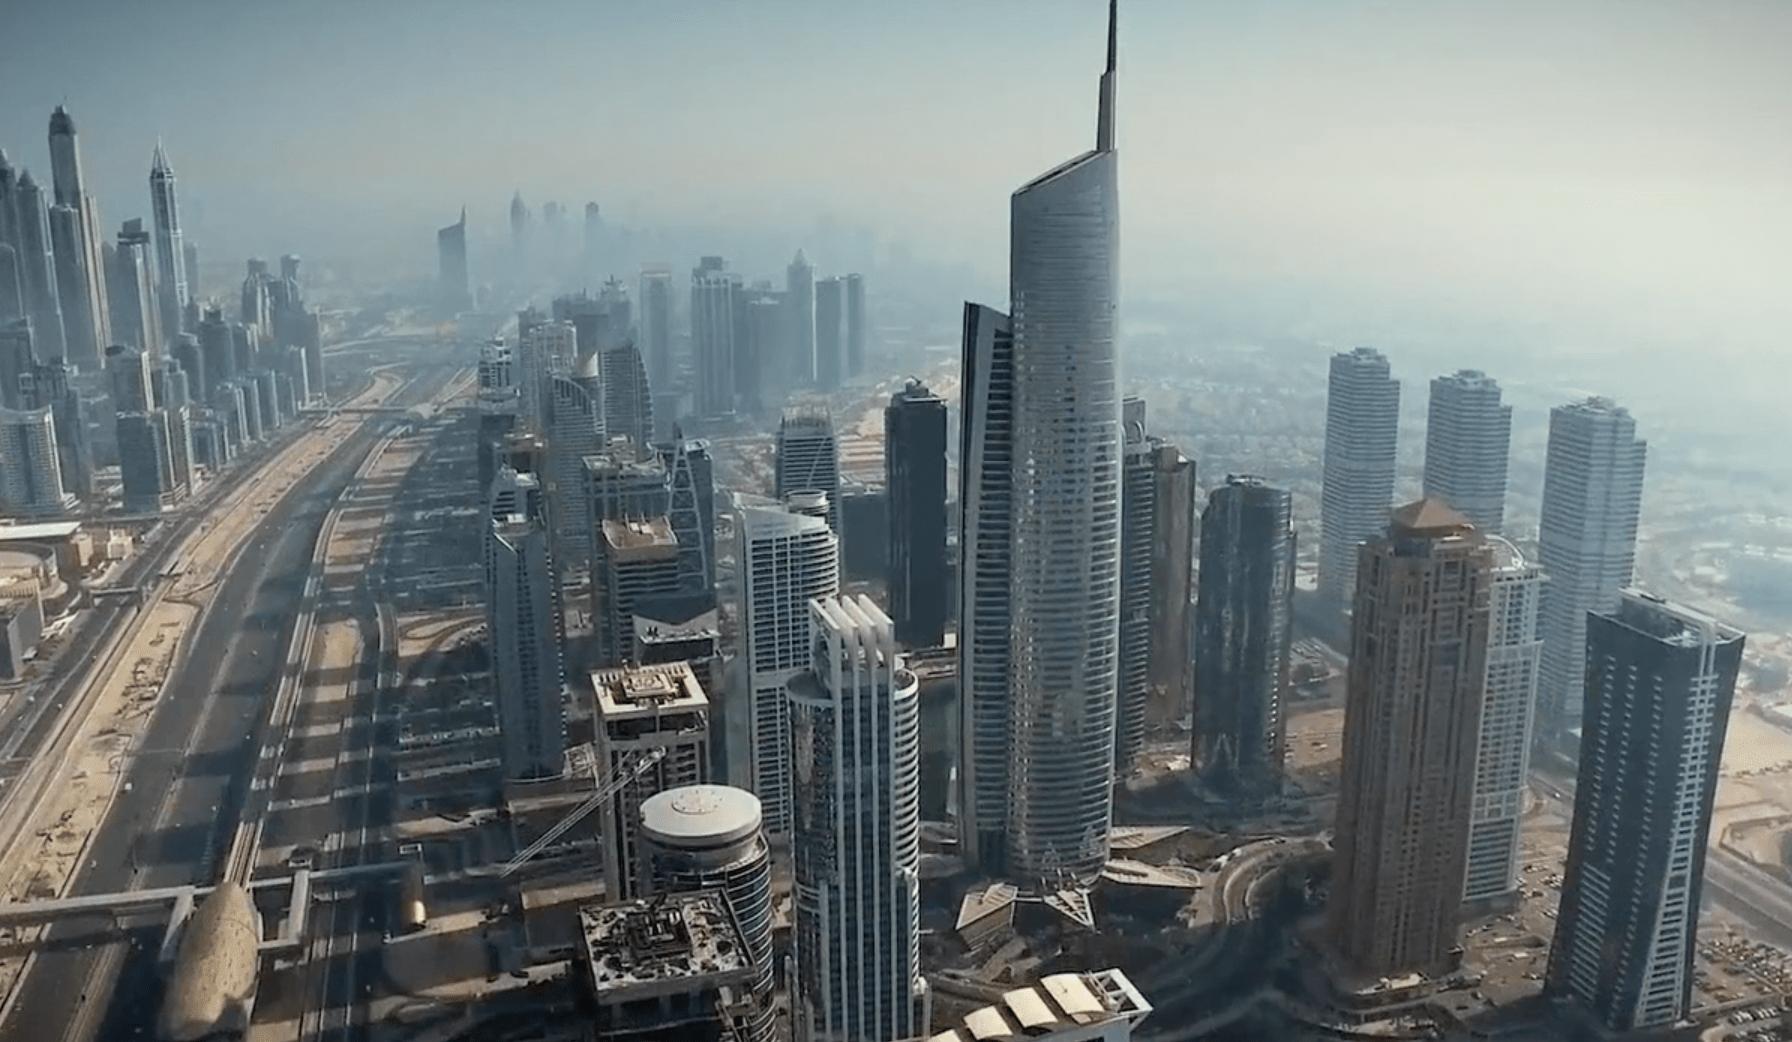 Video & Film Production Dubai - UAE - image Screen-Shot-2021-03-15-at-5.02.10-PM on https://www.kalideme.com